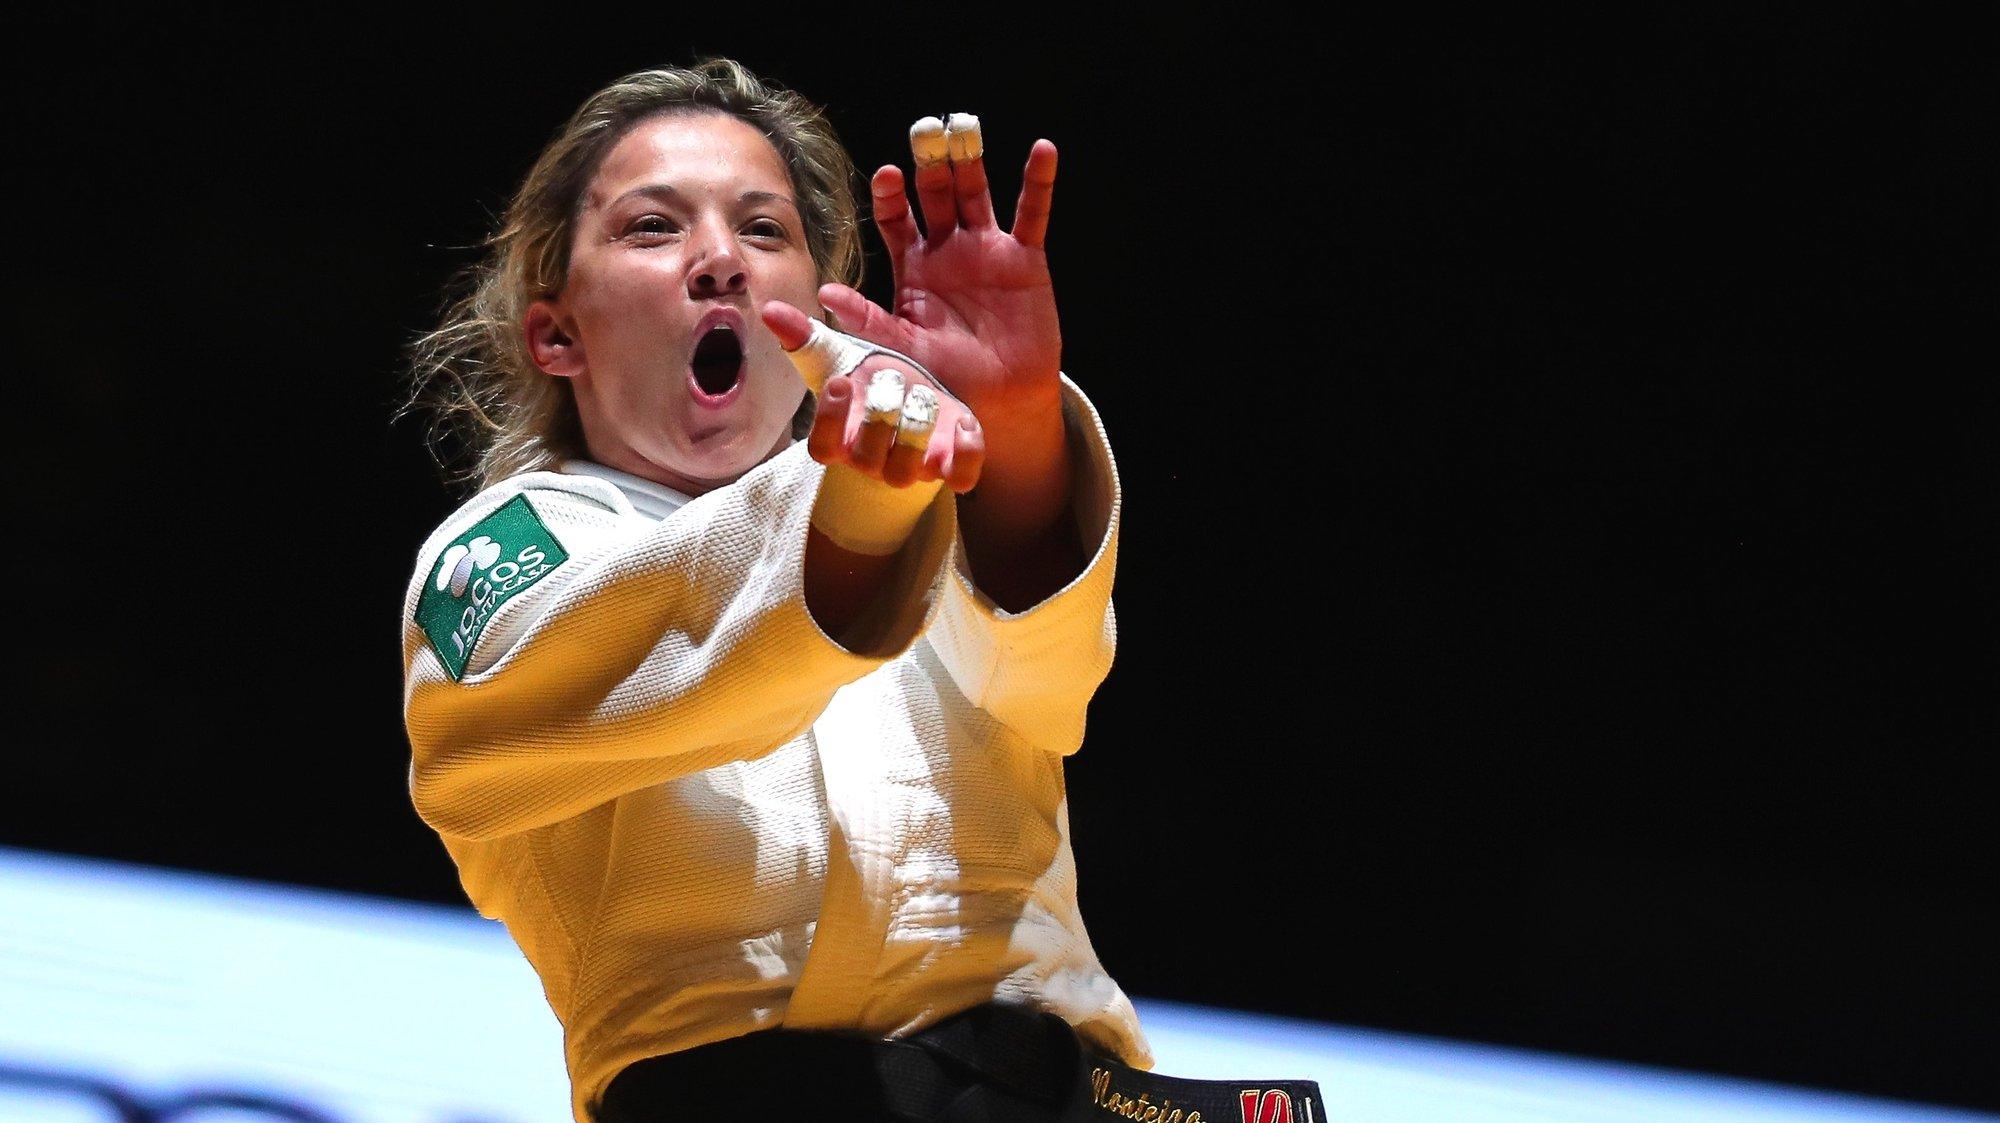 epa09140071 Telma Monteiro of Portugal celebrates after beating Kaja Kajzer of Slovenia in their gold medal bout of the women's -57kg category at the European Judo Championships in Lisbon, Portugal, 16 April 2021.  EPA/NUNO VEIGA